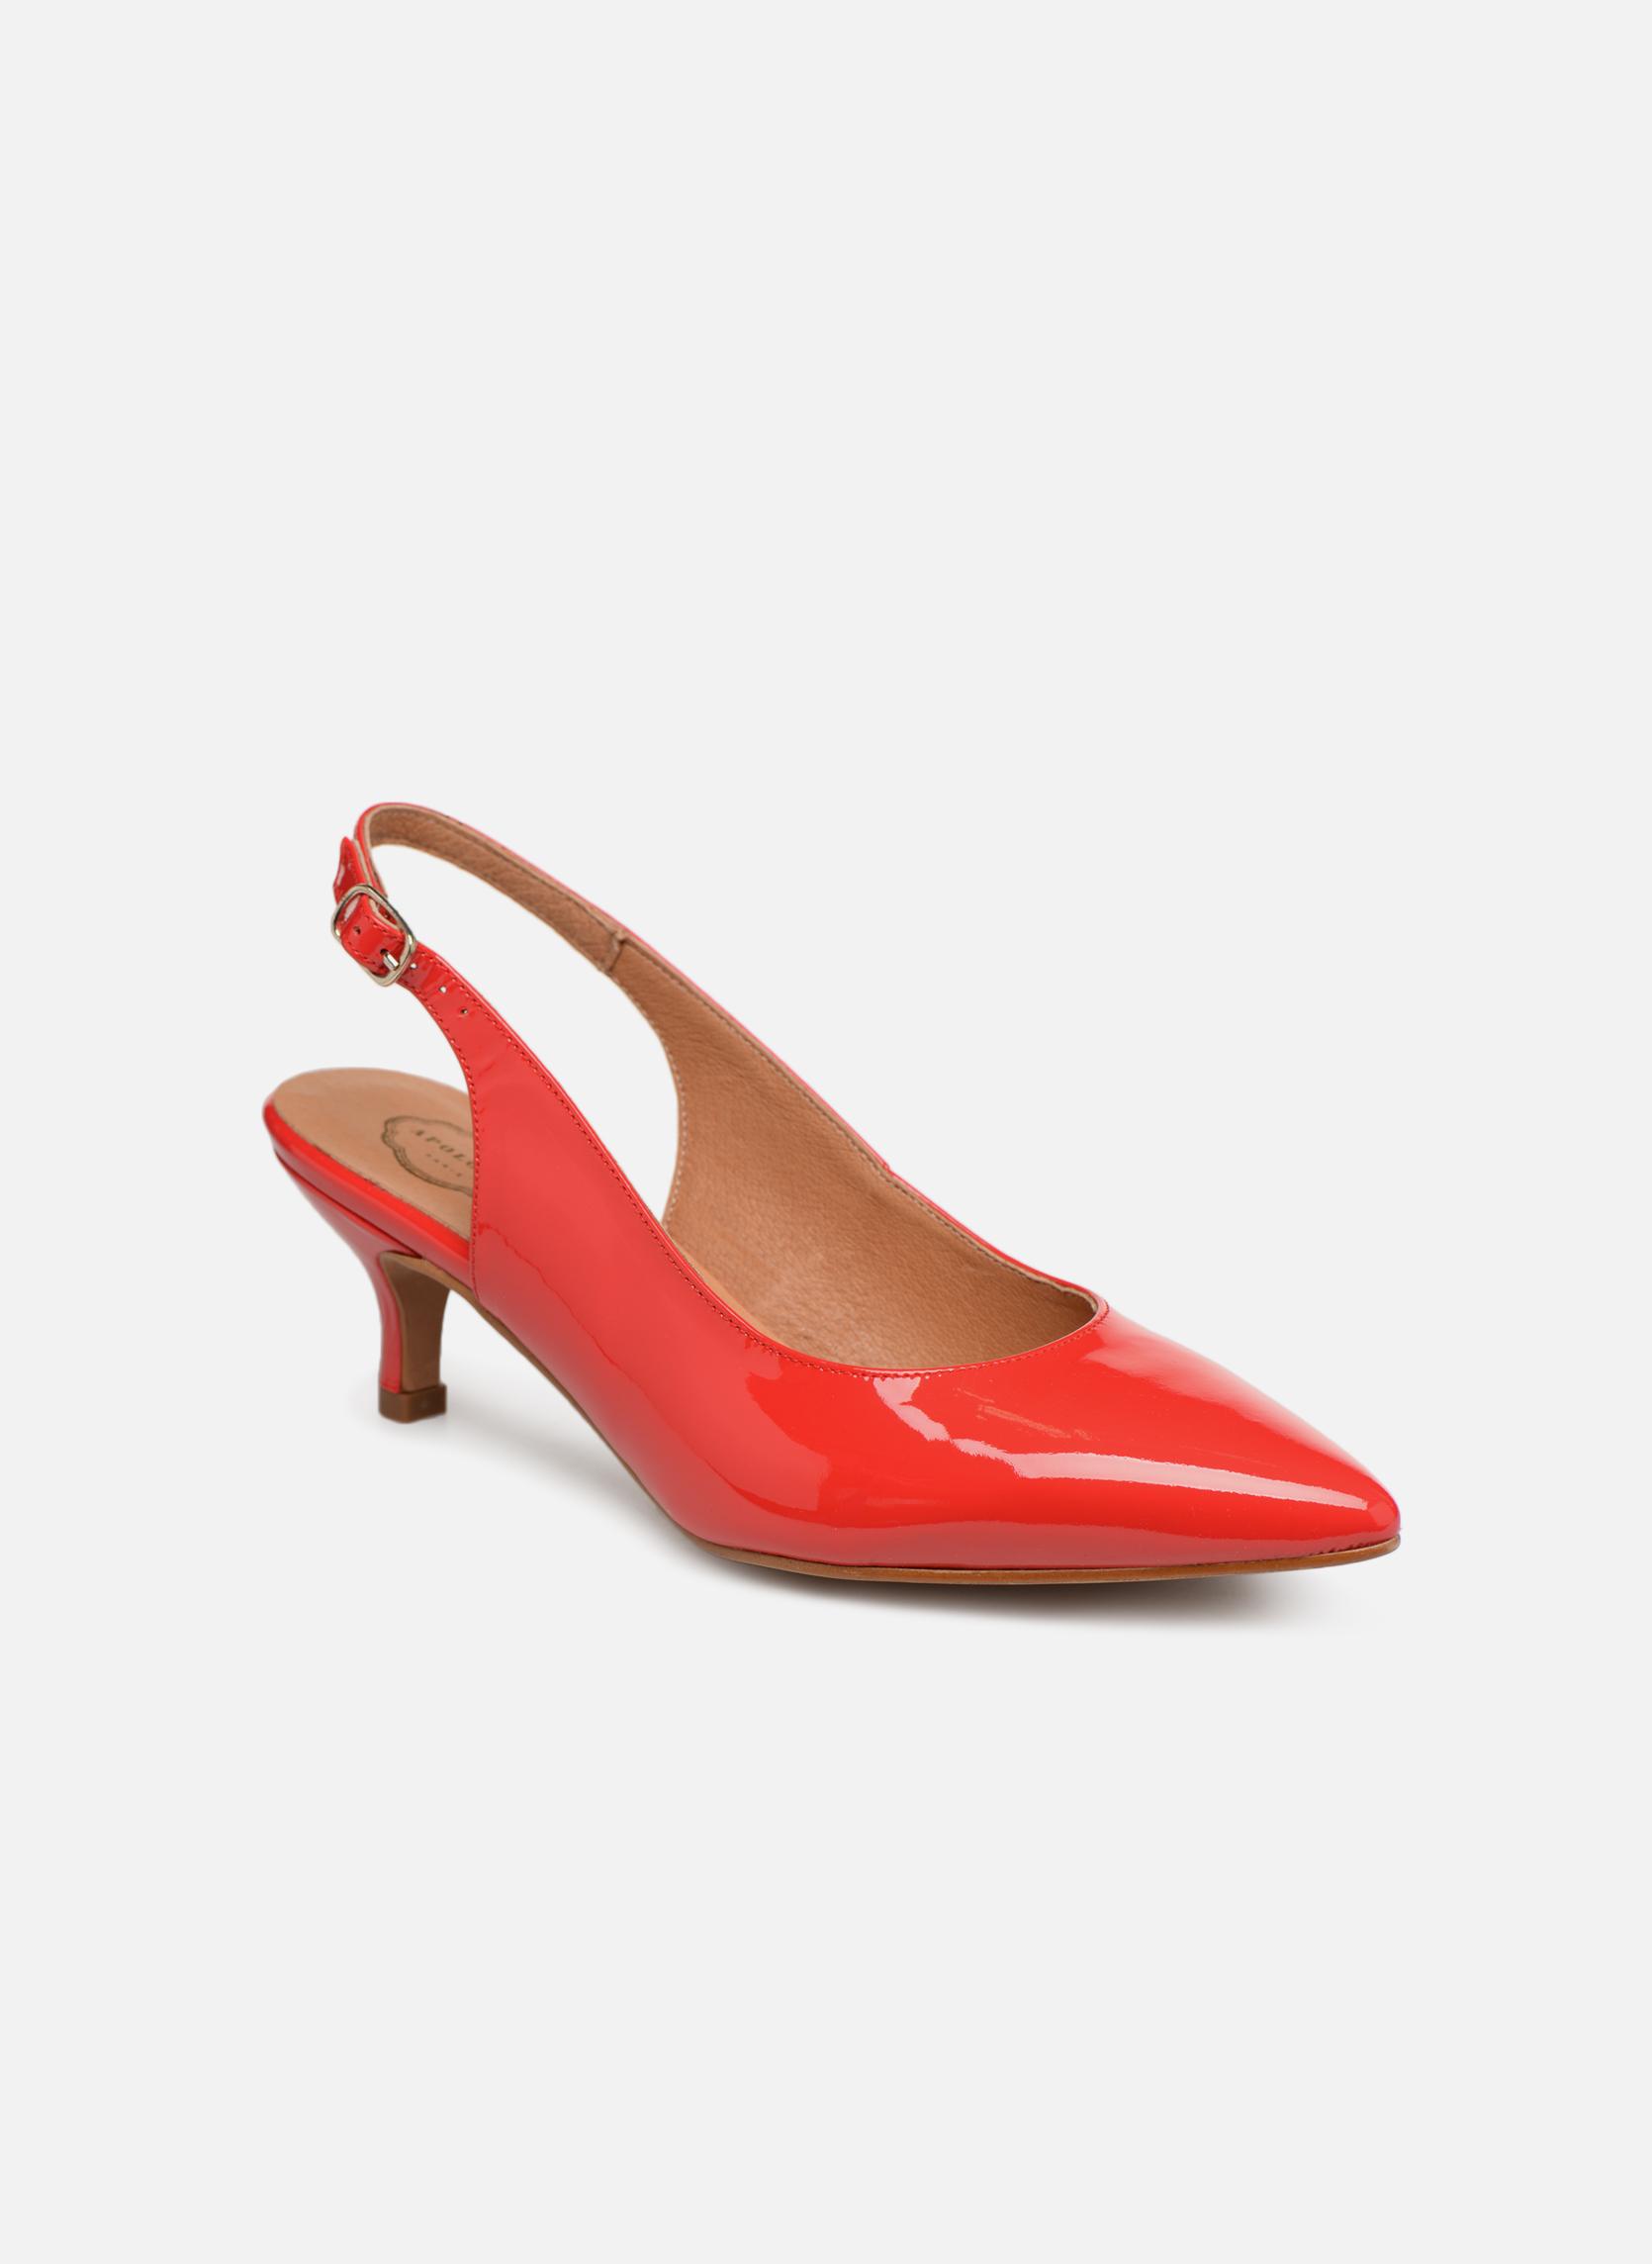 Grandes descuentos últimos zapatos Apologie DESTALONADO SHI (Rojo) - Zapatos de tacón Descuento